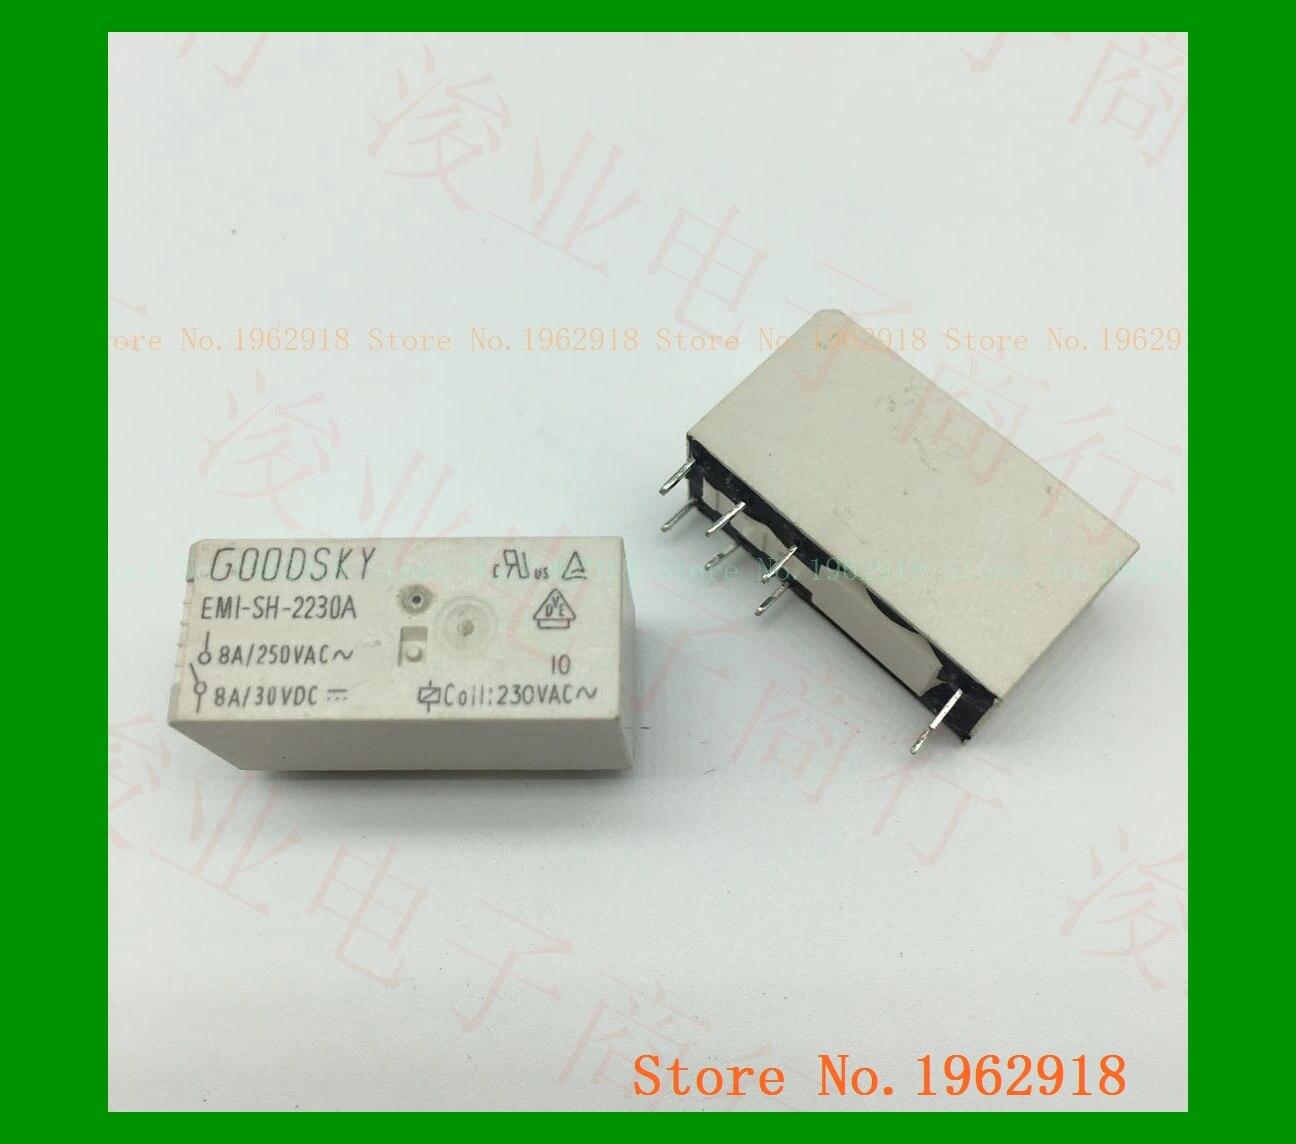 EMI-SH-2230A 230V 8 8A RTE24730